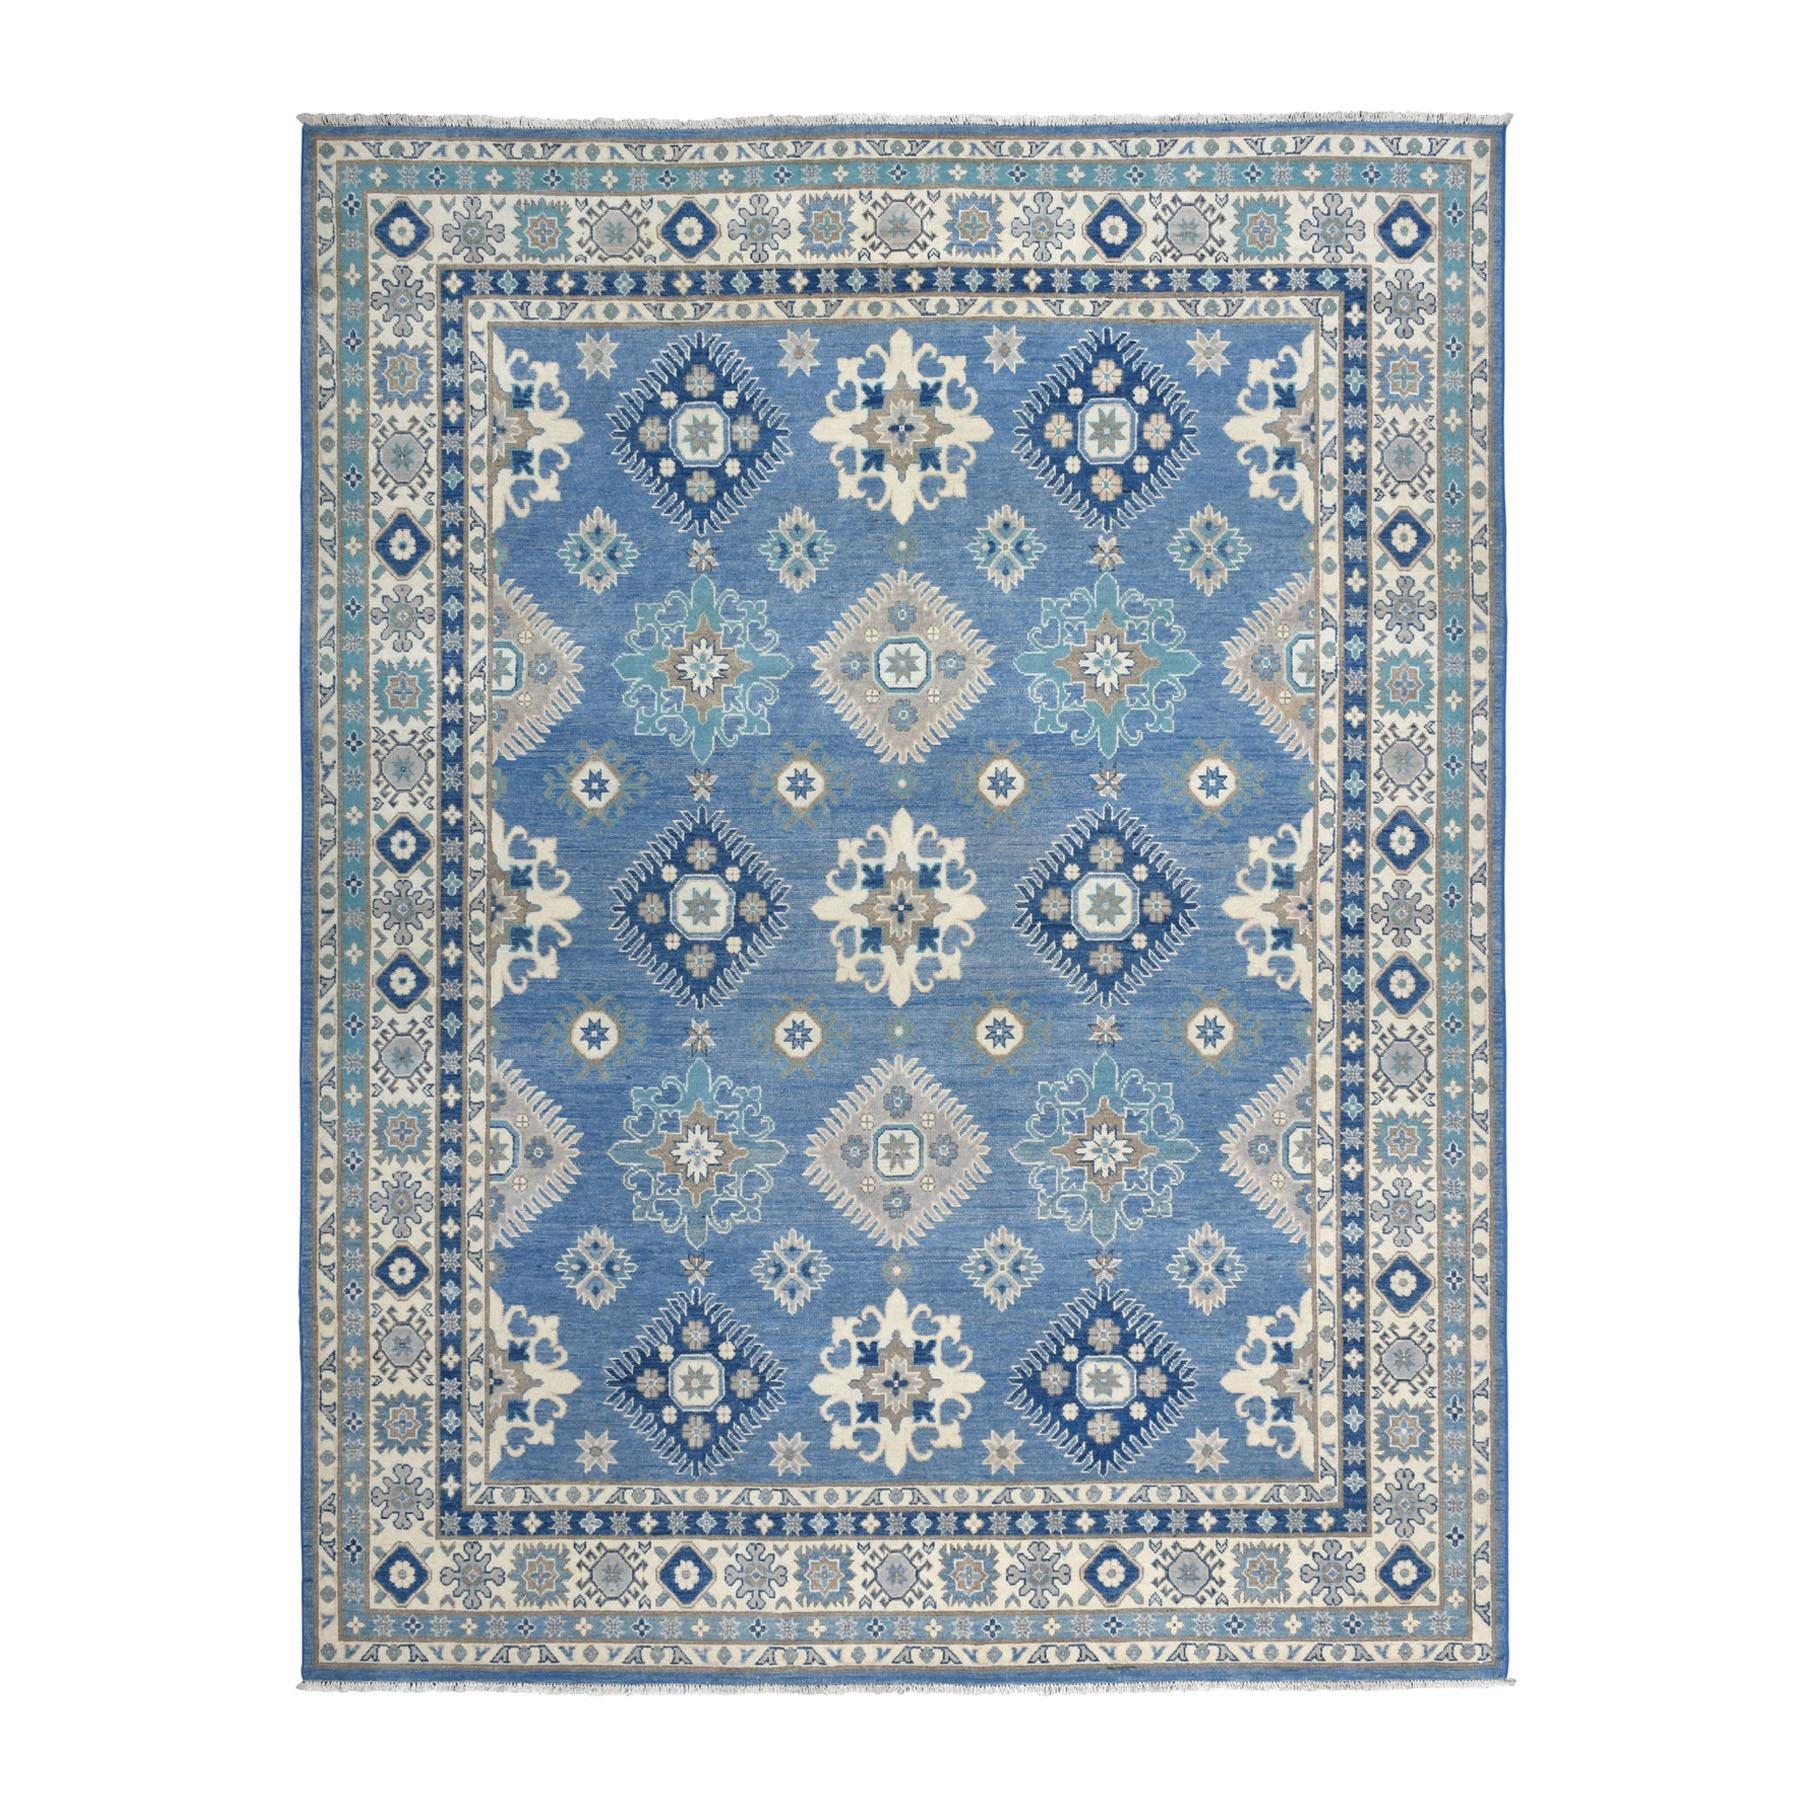 "7'9""X10' Blue Vintage Look Kazak Tribal Design Pure Wool Hand Knotted Oriental Rug moaeb7ce"